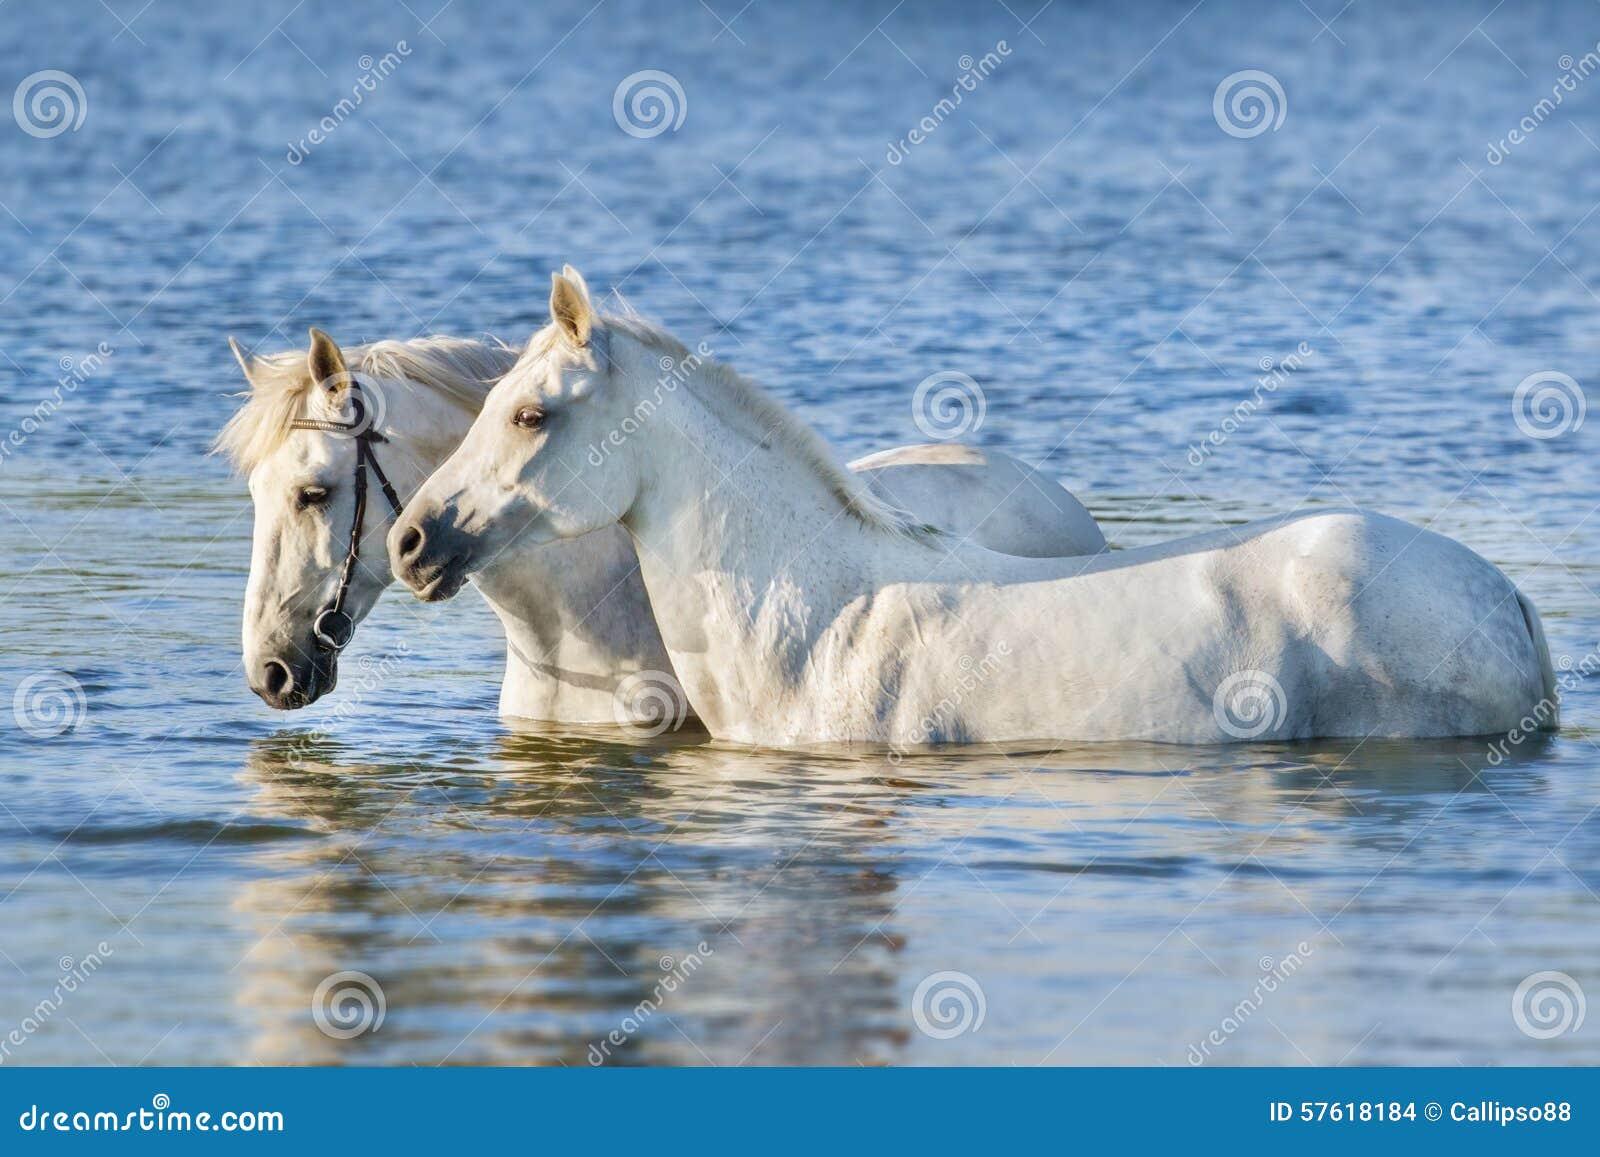 Una nuotata di due cavalli bianchi in acqua